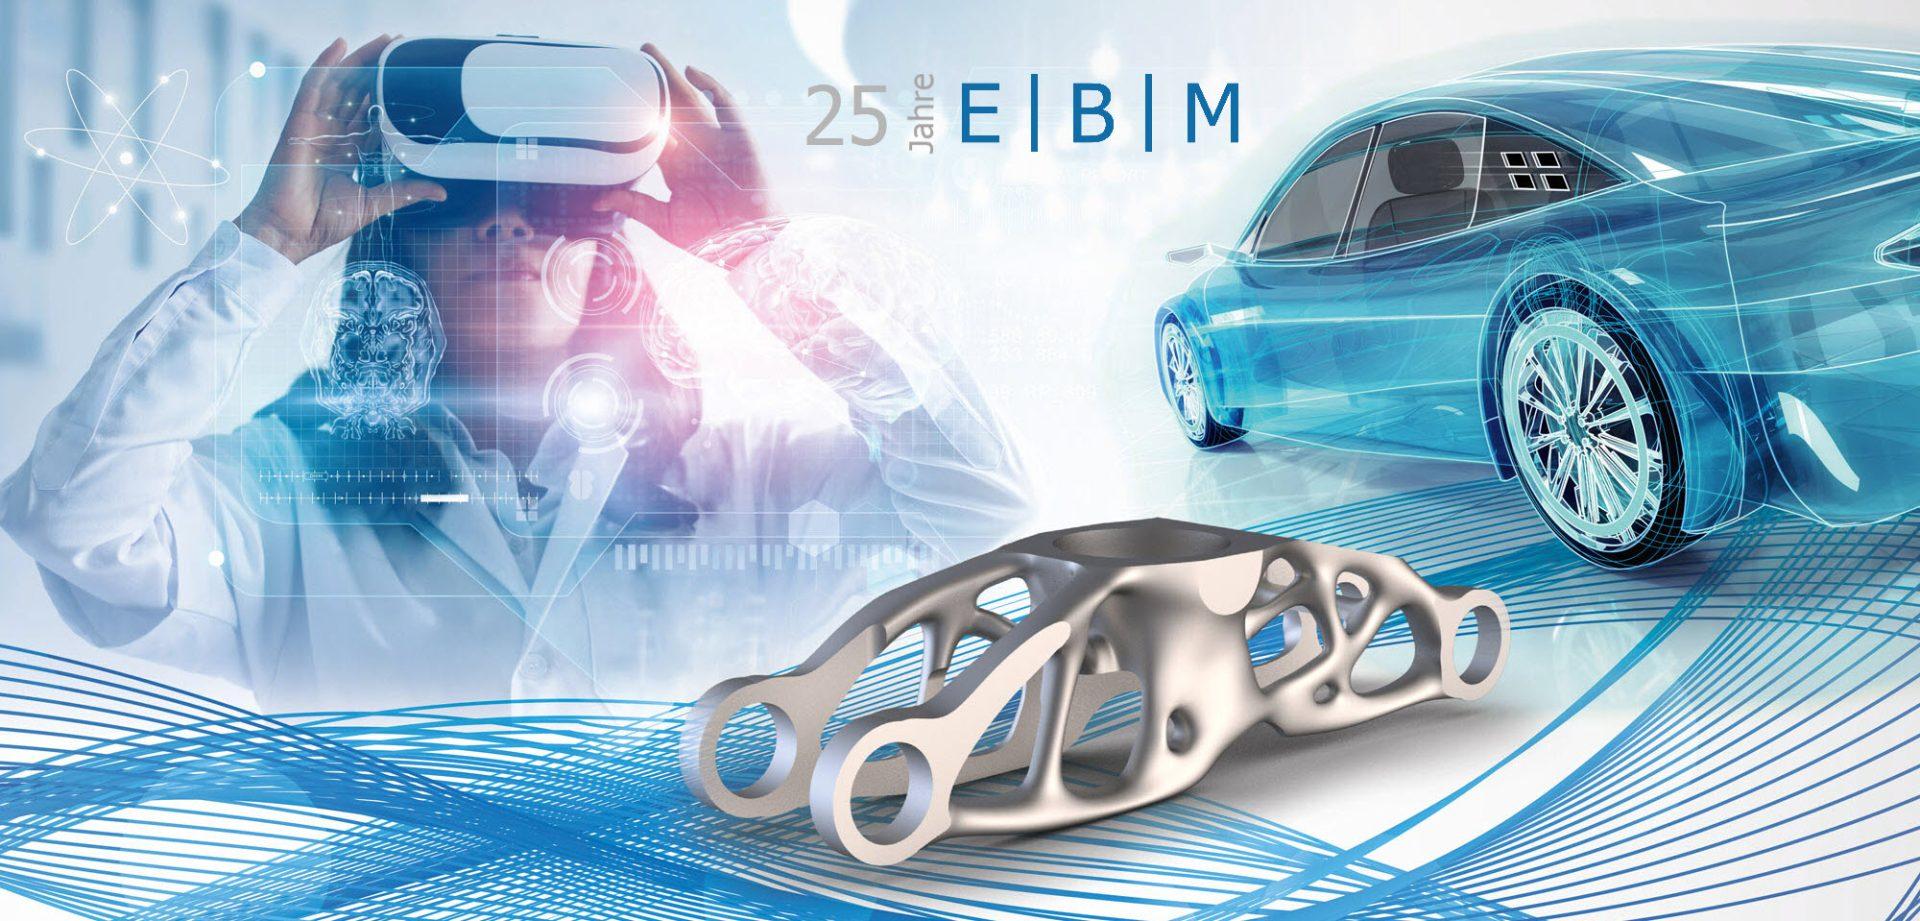 25 Jahre EBM Technologietag Logo